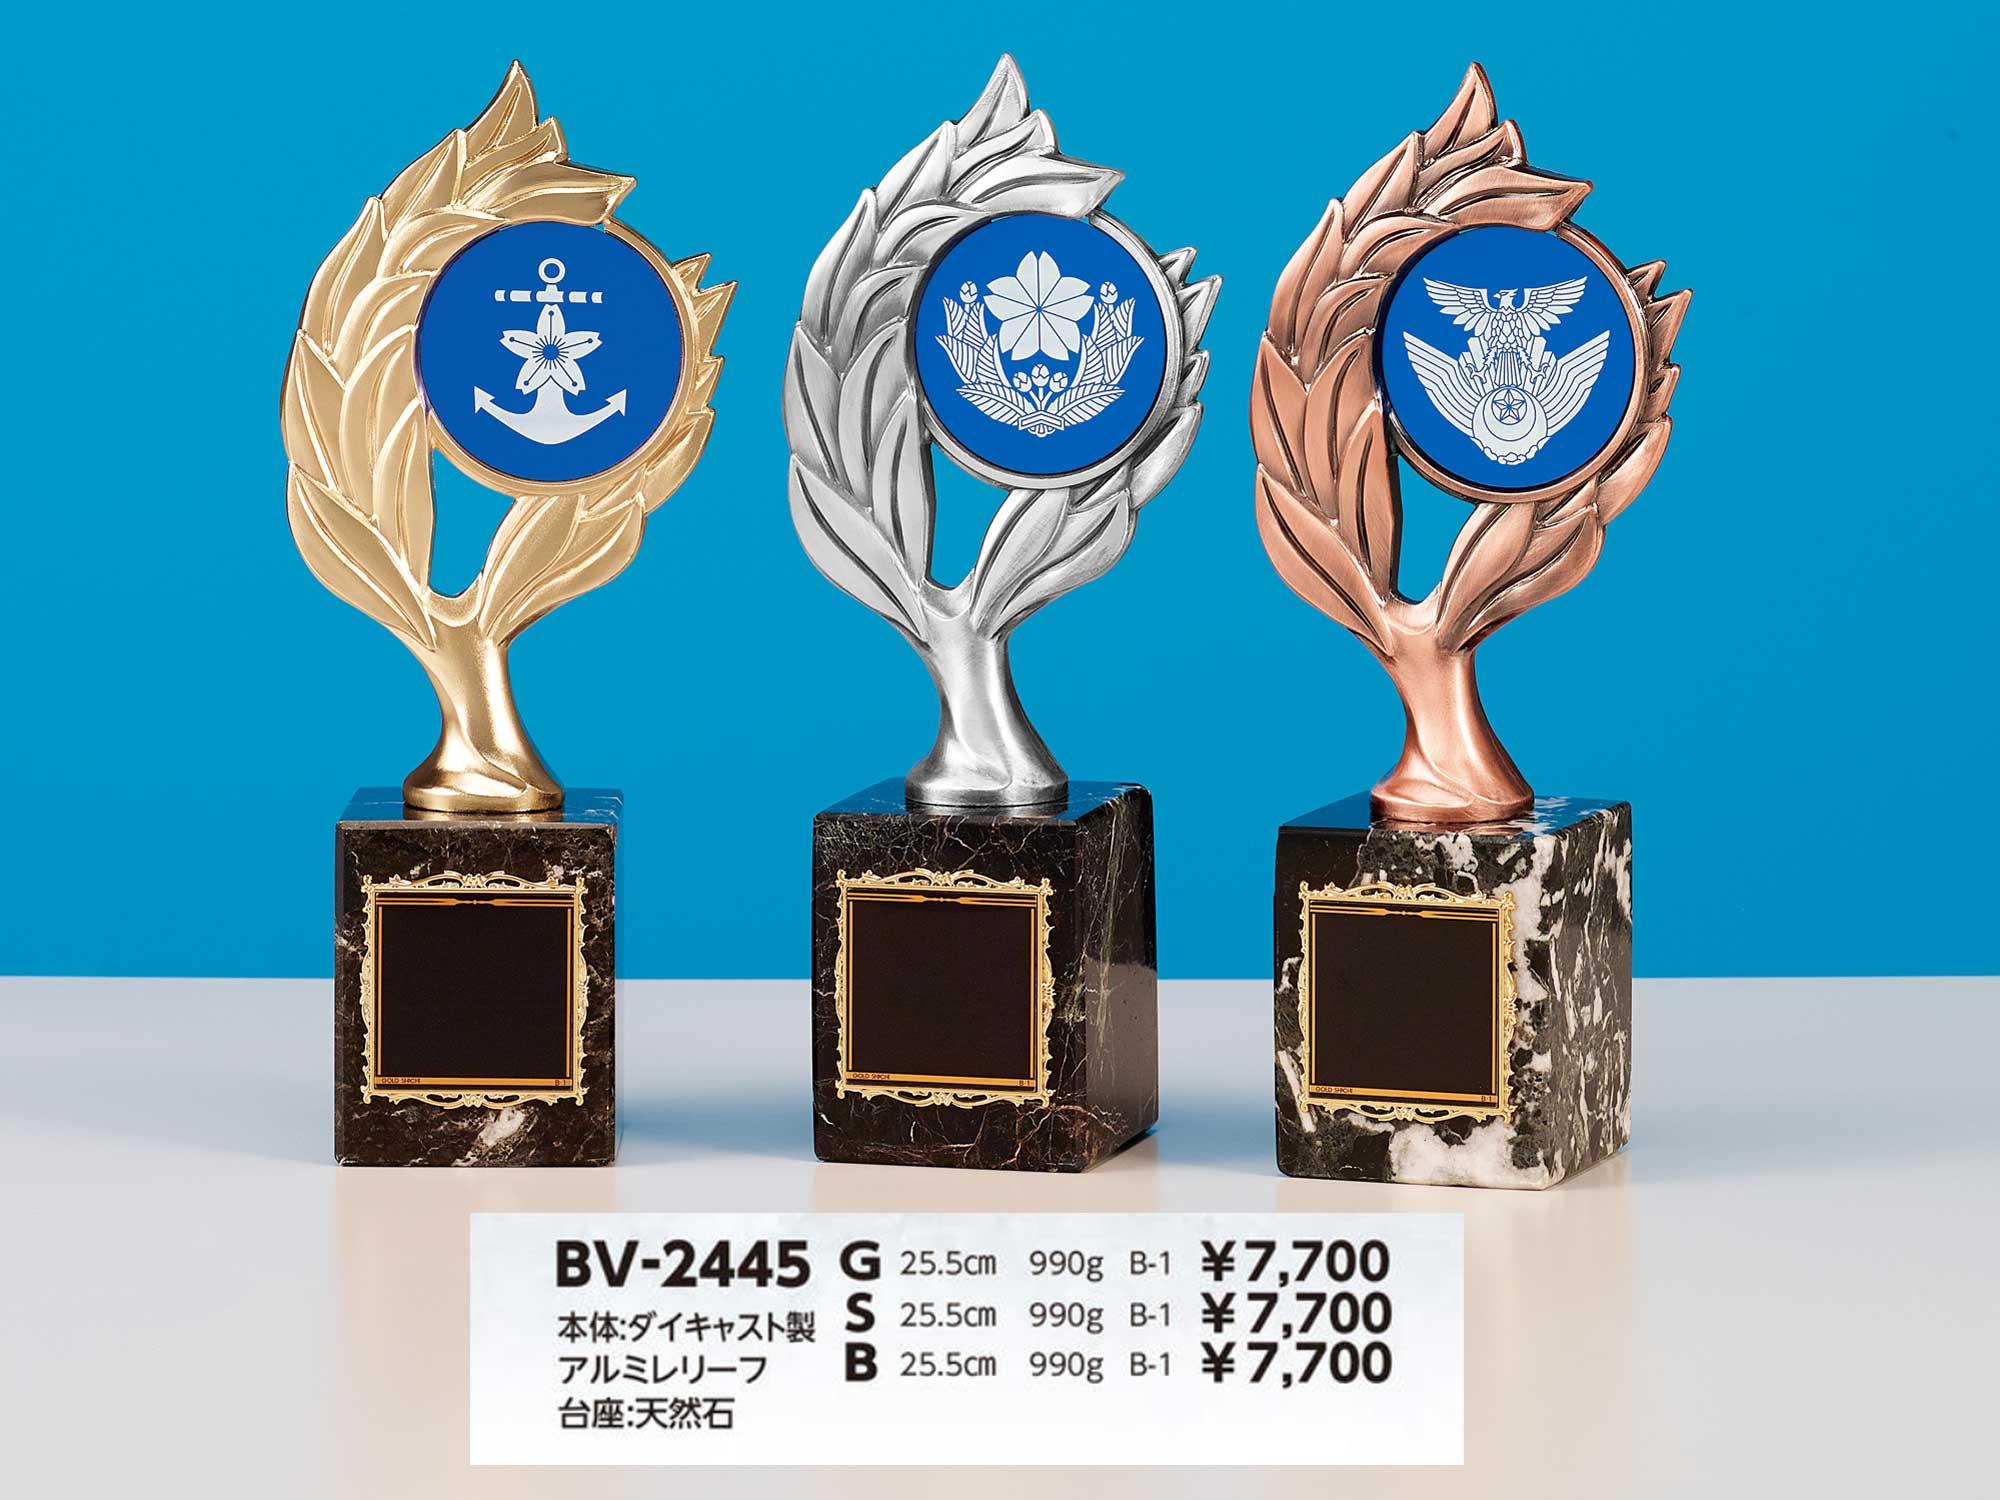 BV2445